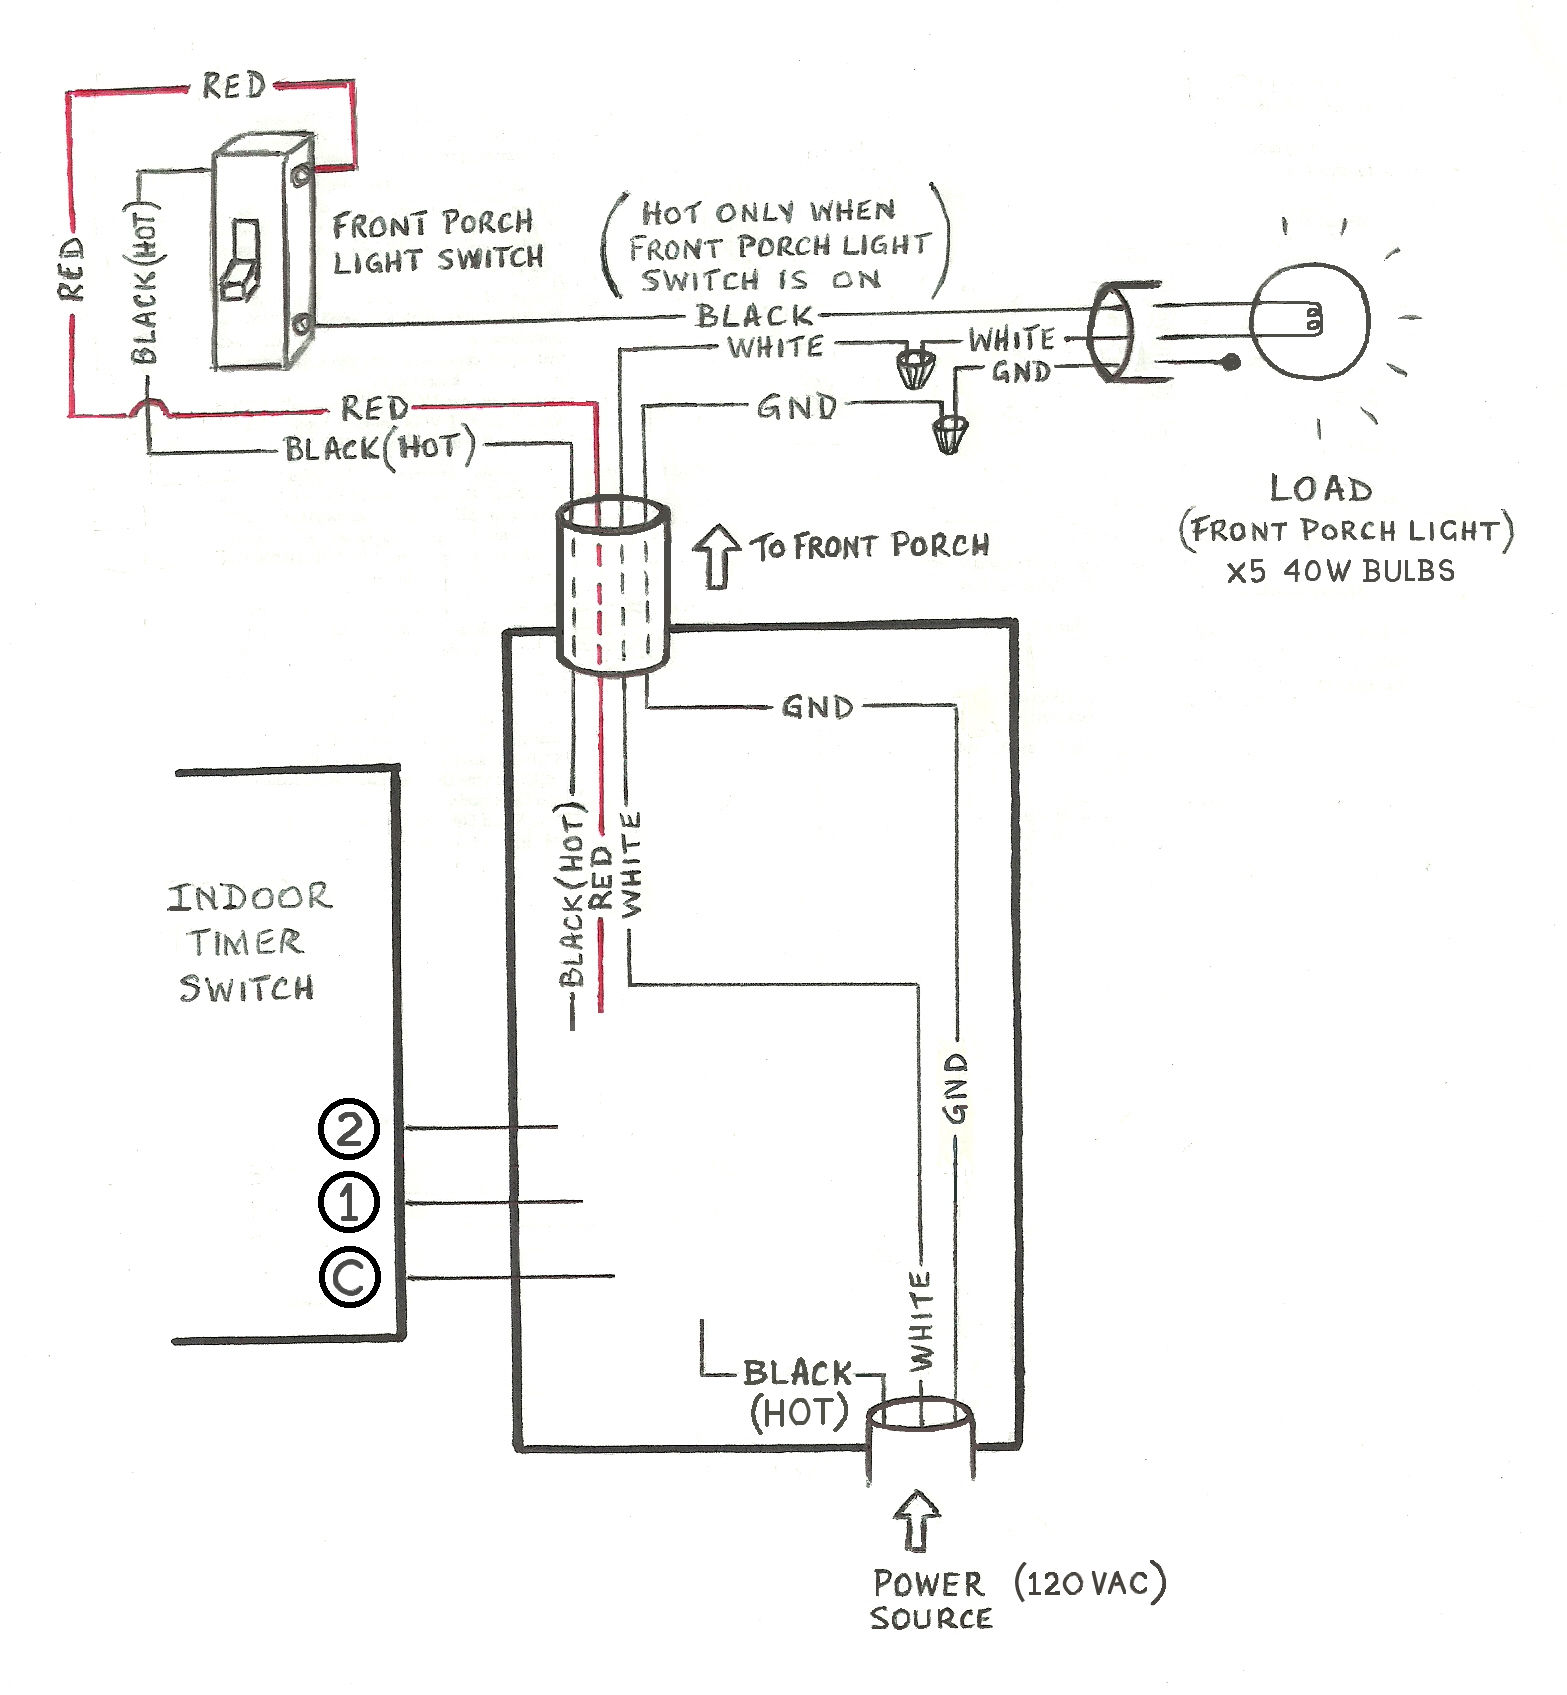 Magnificent Need Help Wiring A 3 Way Honeywell Digital Timer Switch Home Wiring Cloud Rineaidewilluminateatxorg